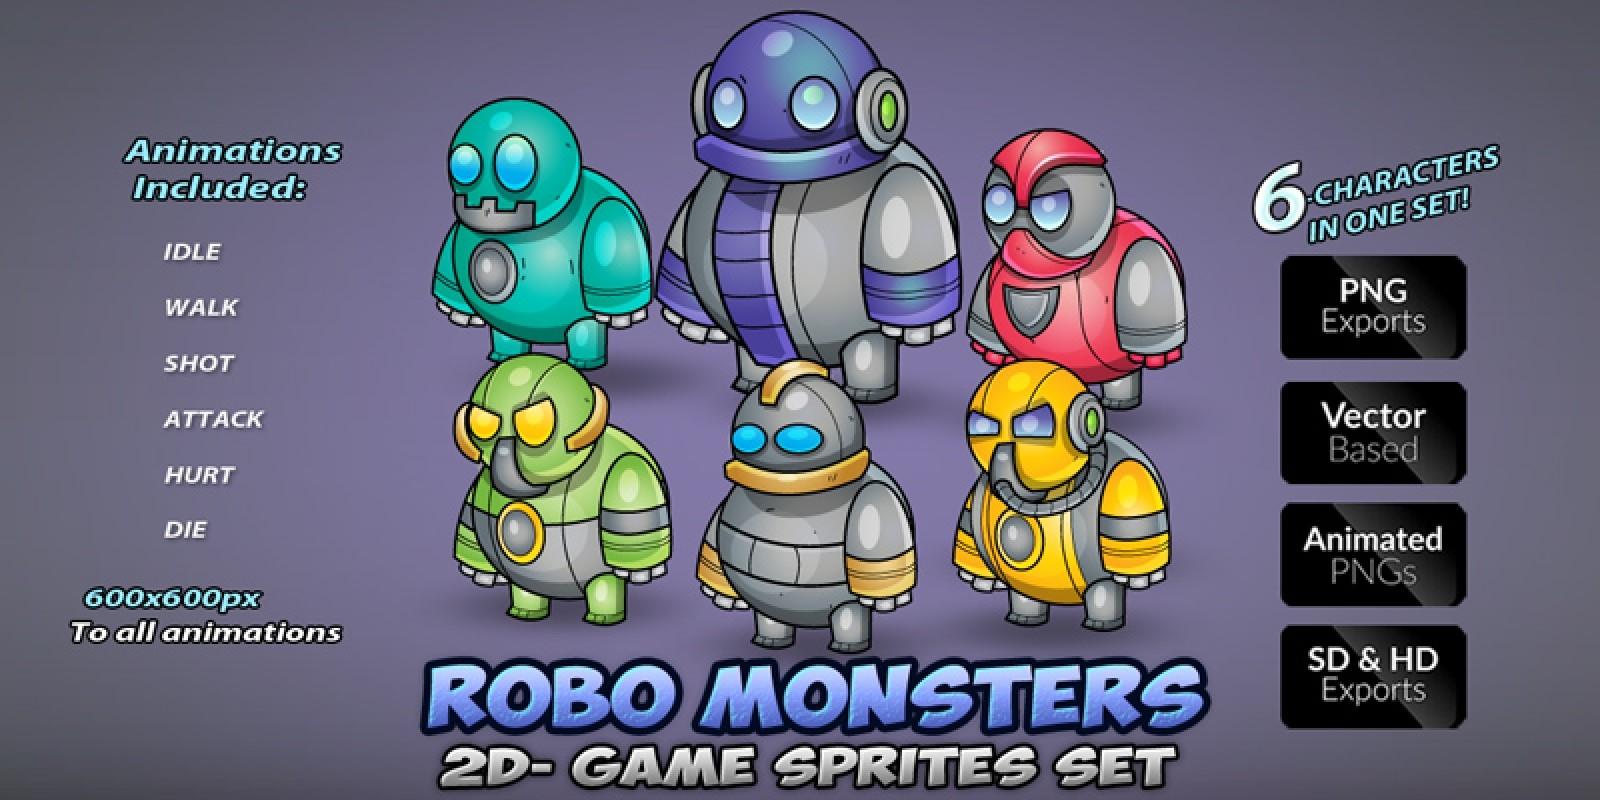 Robo Monsters Game Sprites Set